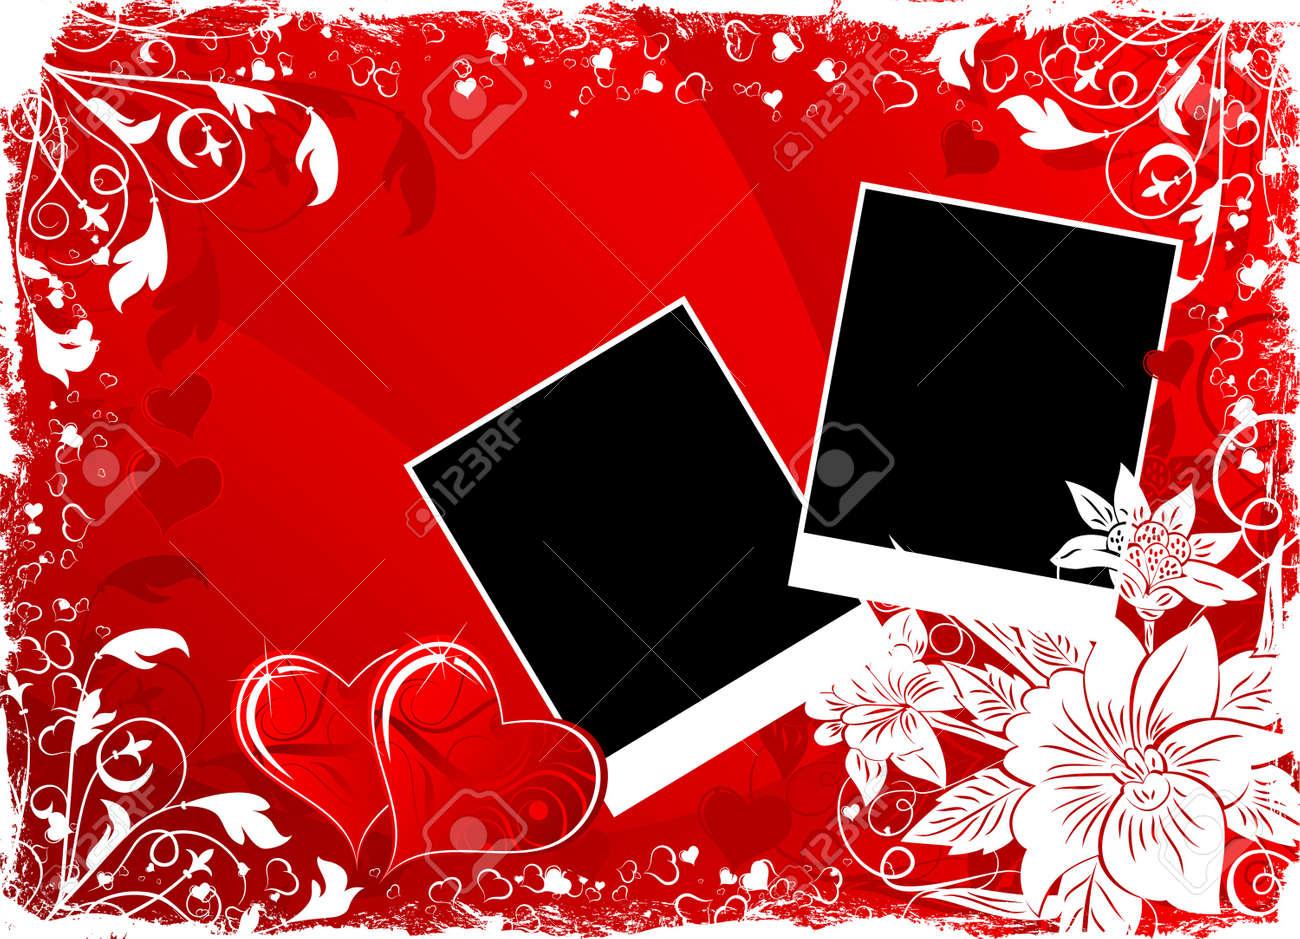 valentine picture frame ideas image collections craft decoration valentine picture frames image collections craft decoration ideas - Valentines Picture Frames